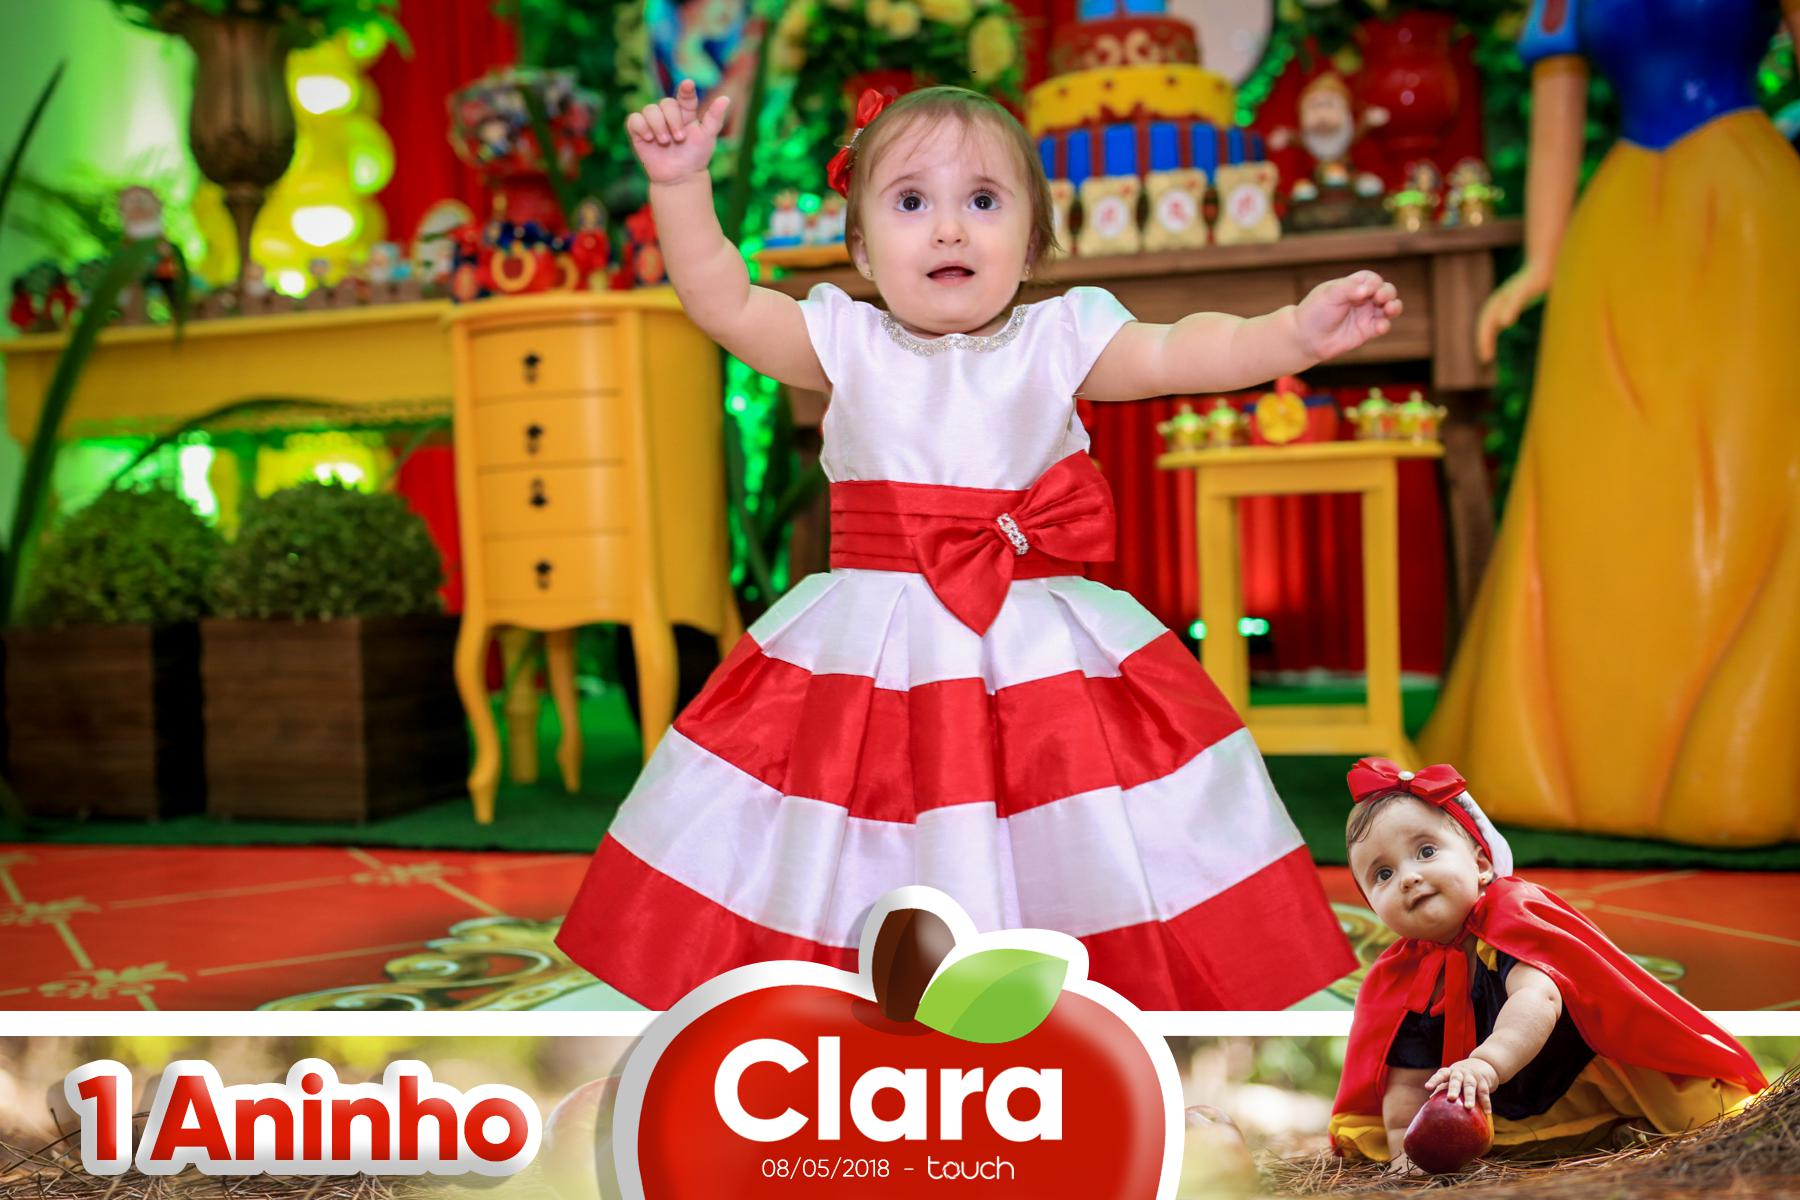 1 aninho Clara